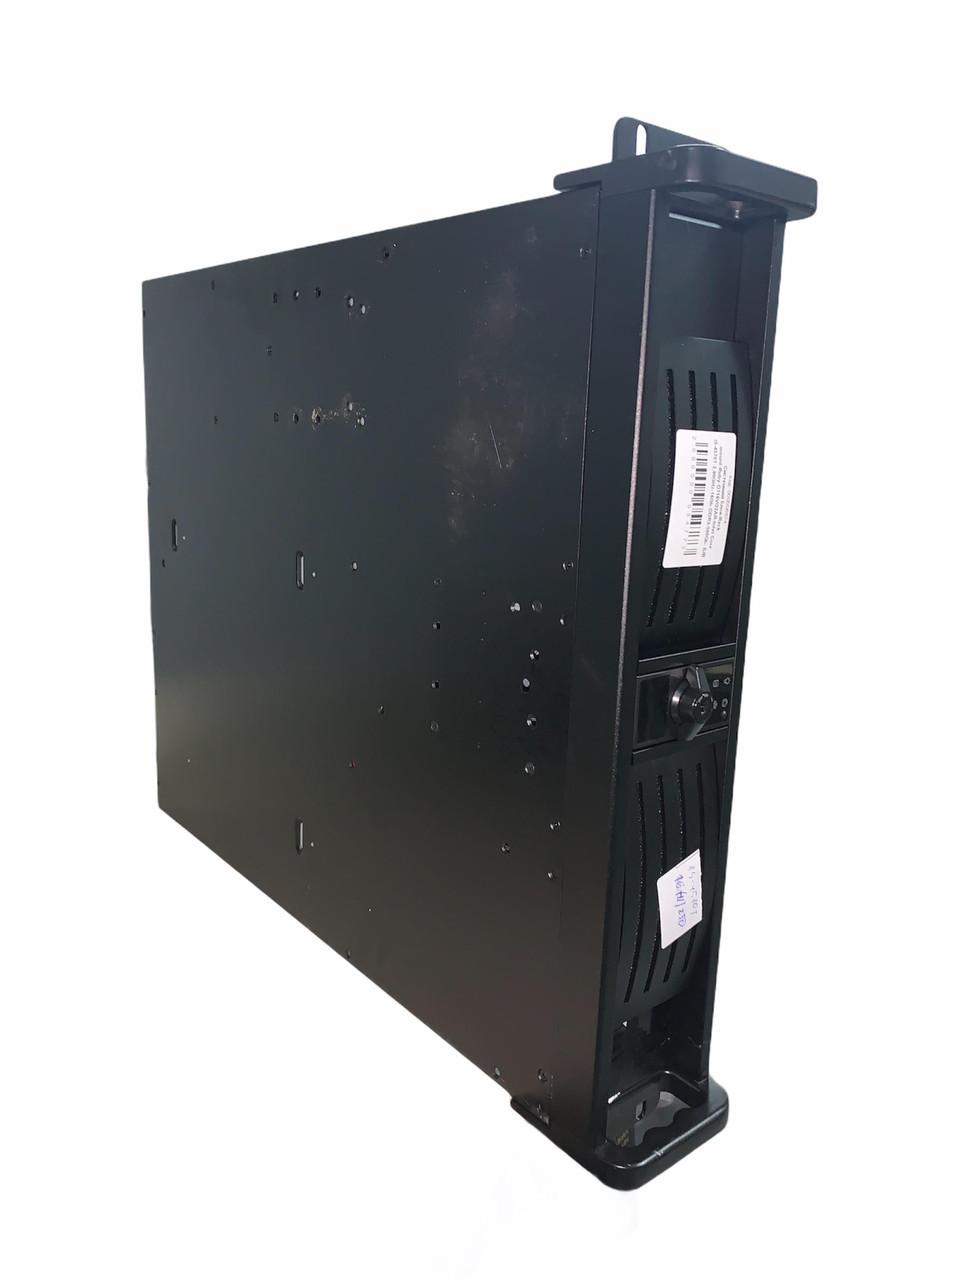 Системный блок-Rack mount-Ruby-D716VG2AR-Intel Core i5-4570T-2,90GHz-16Gb-DDR3-500Gb- Б/У